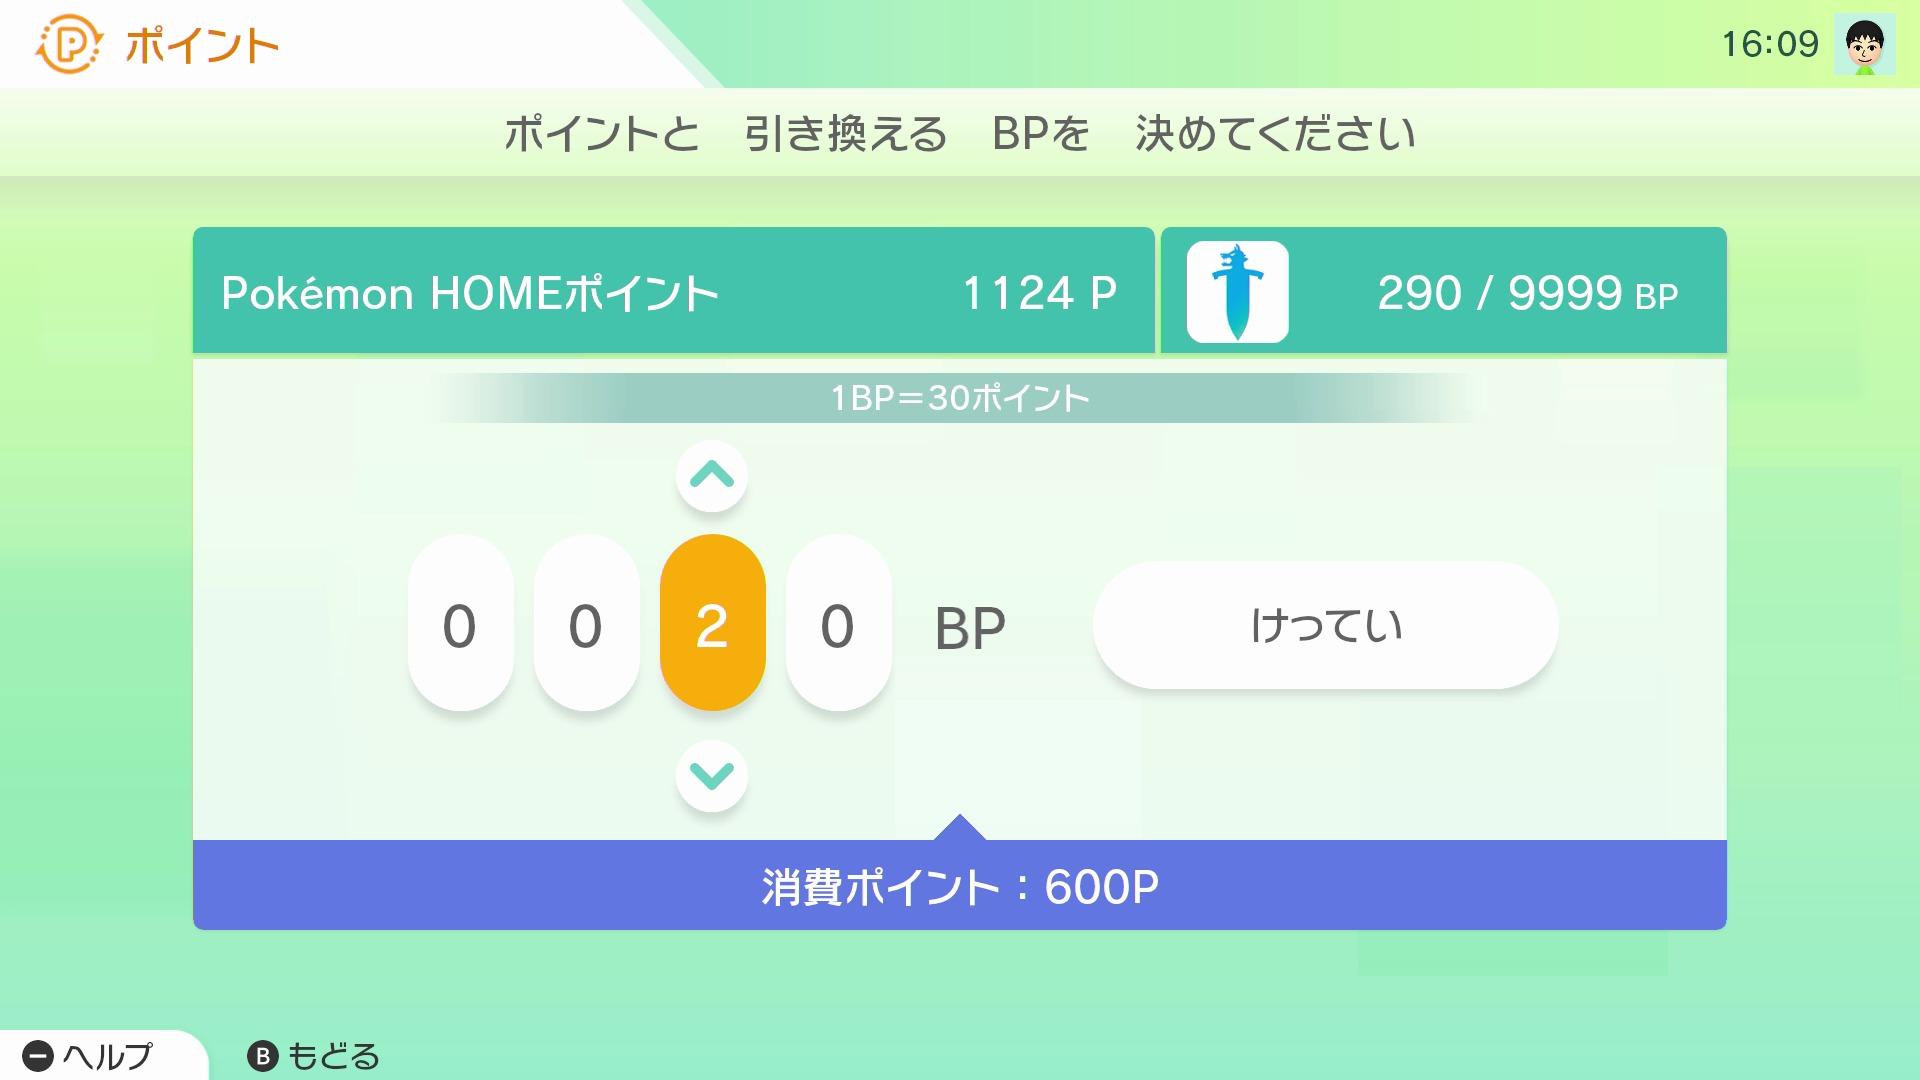 Pokémon HOMEポイント (C)2020 Pokémon. (C)1995-2020 Nintendo/Creatures Inc. /GAME FREAK inc.